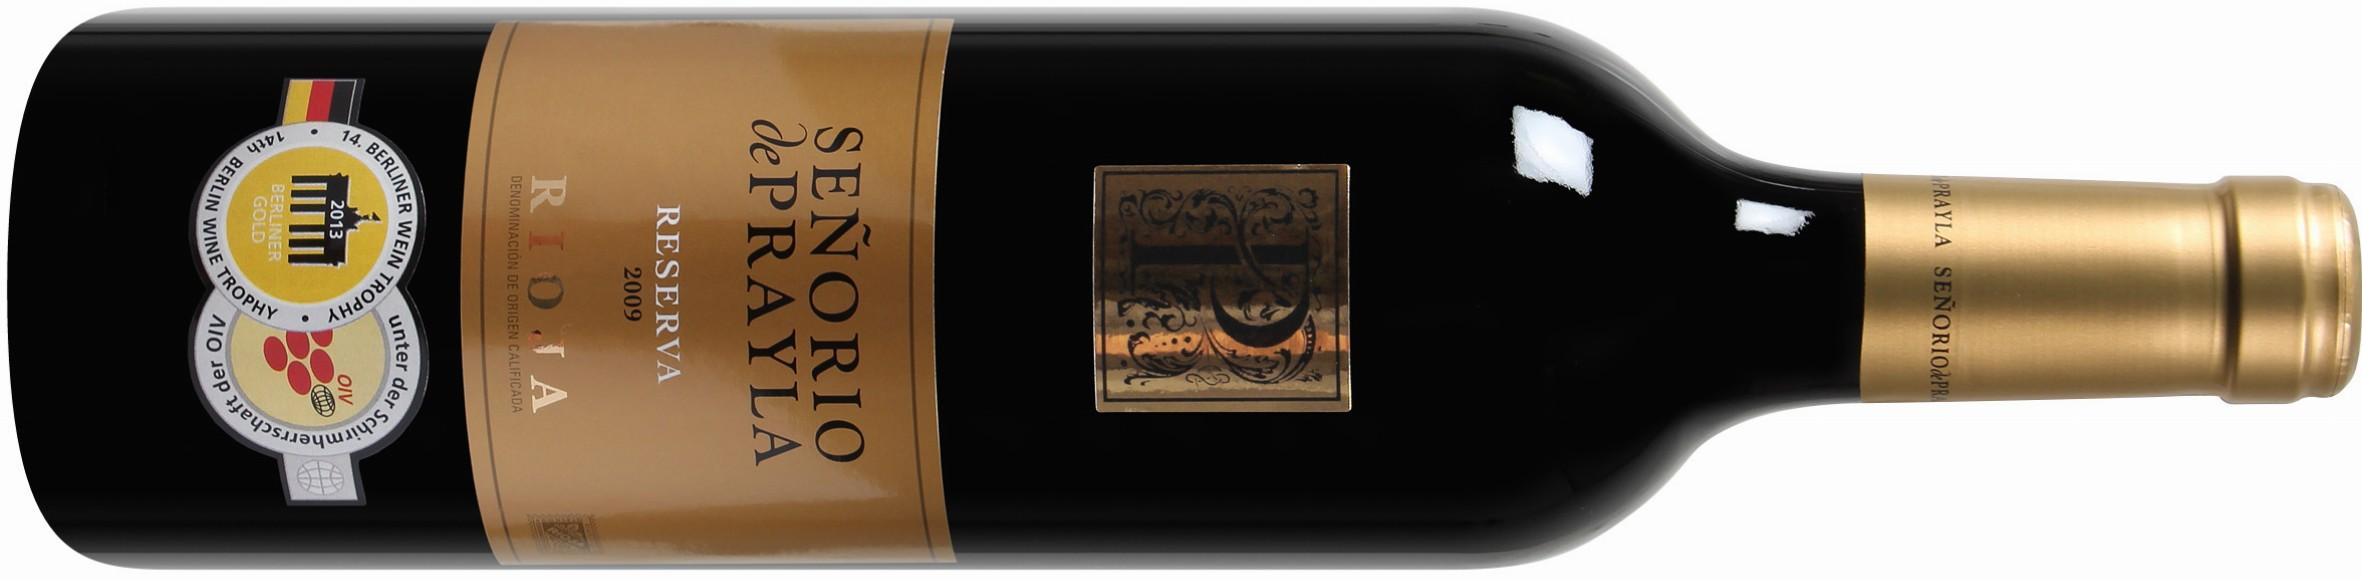 Señorio de Prayla Rioja DOCa Reserva 2009